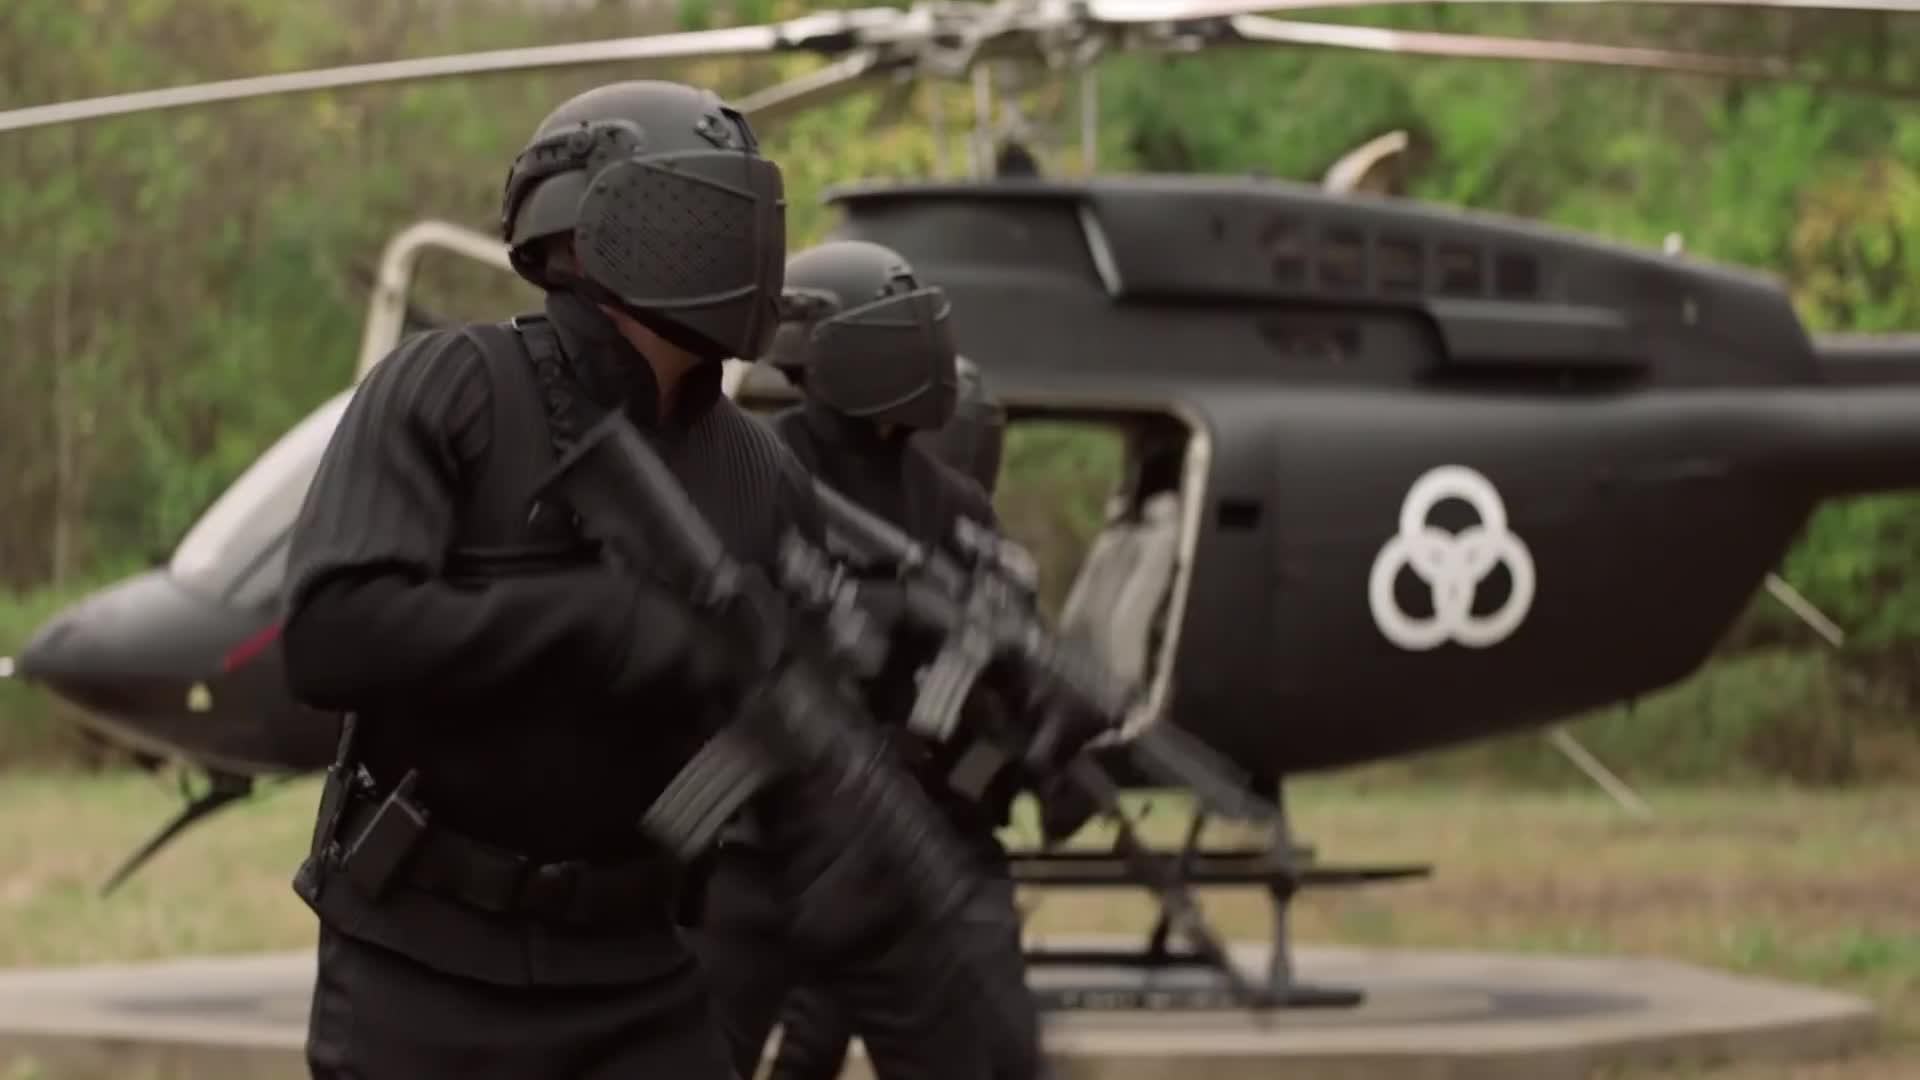 Trailer, Serie, Amazon Prime Video, Prime Video, Zombies, The Walking Dead, AMC, The Walking Dead: World Beyond, World Beyond